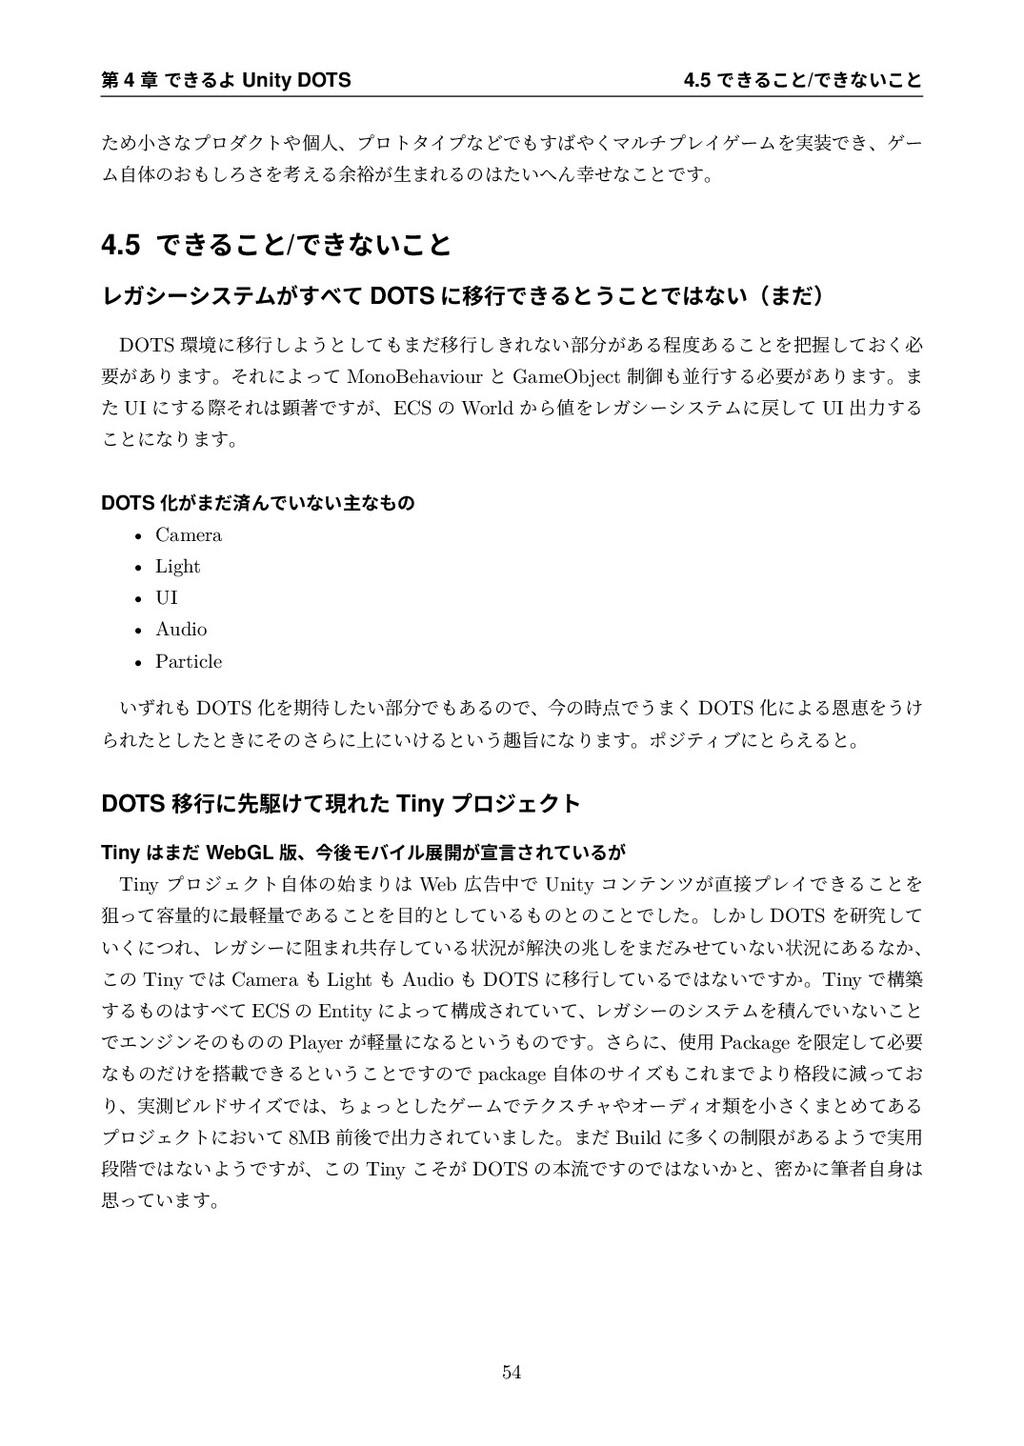 ୈ 4 ষ Ͱ͖ΔΑ Unity DOTS 4.5 Ͱ͖Δ͜ͱ/Ͱ͖ͳ͍͜ͱ ͨΊখ͞ͳϓϩμ...